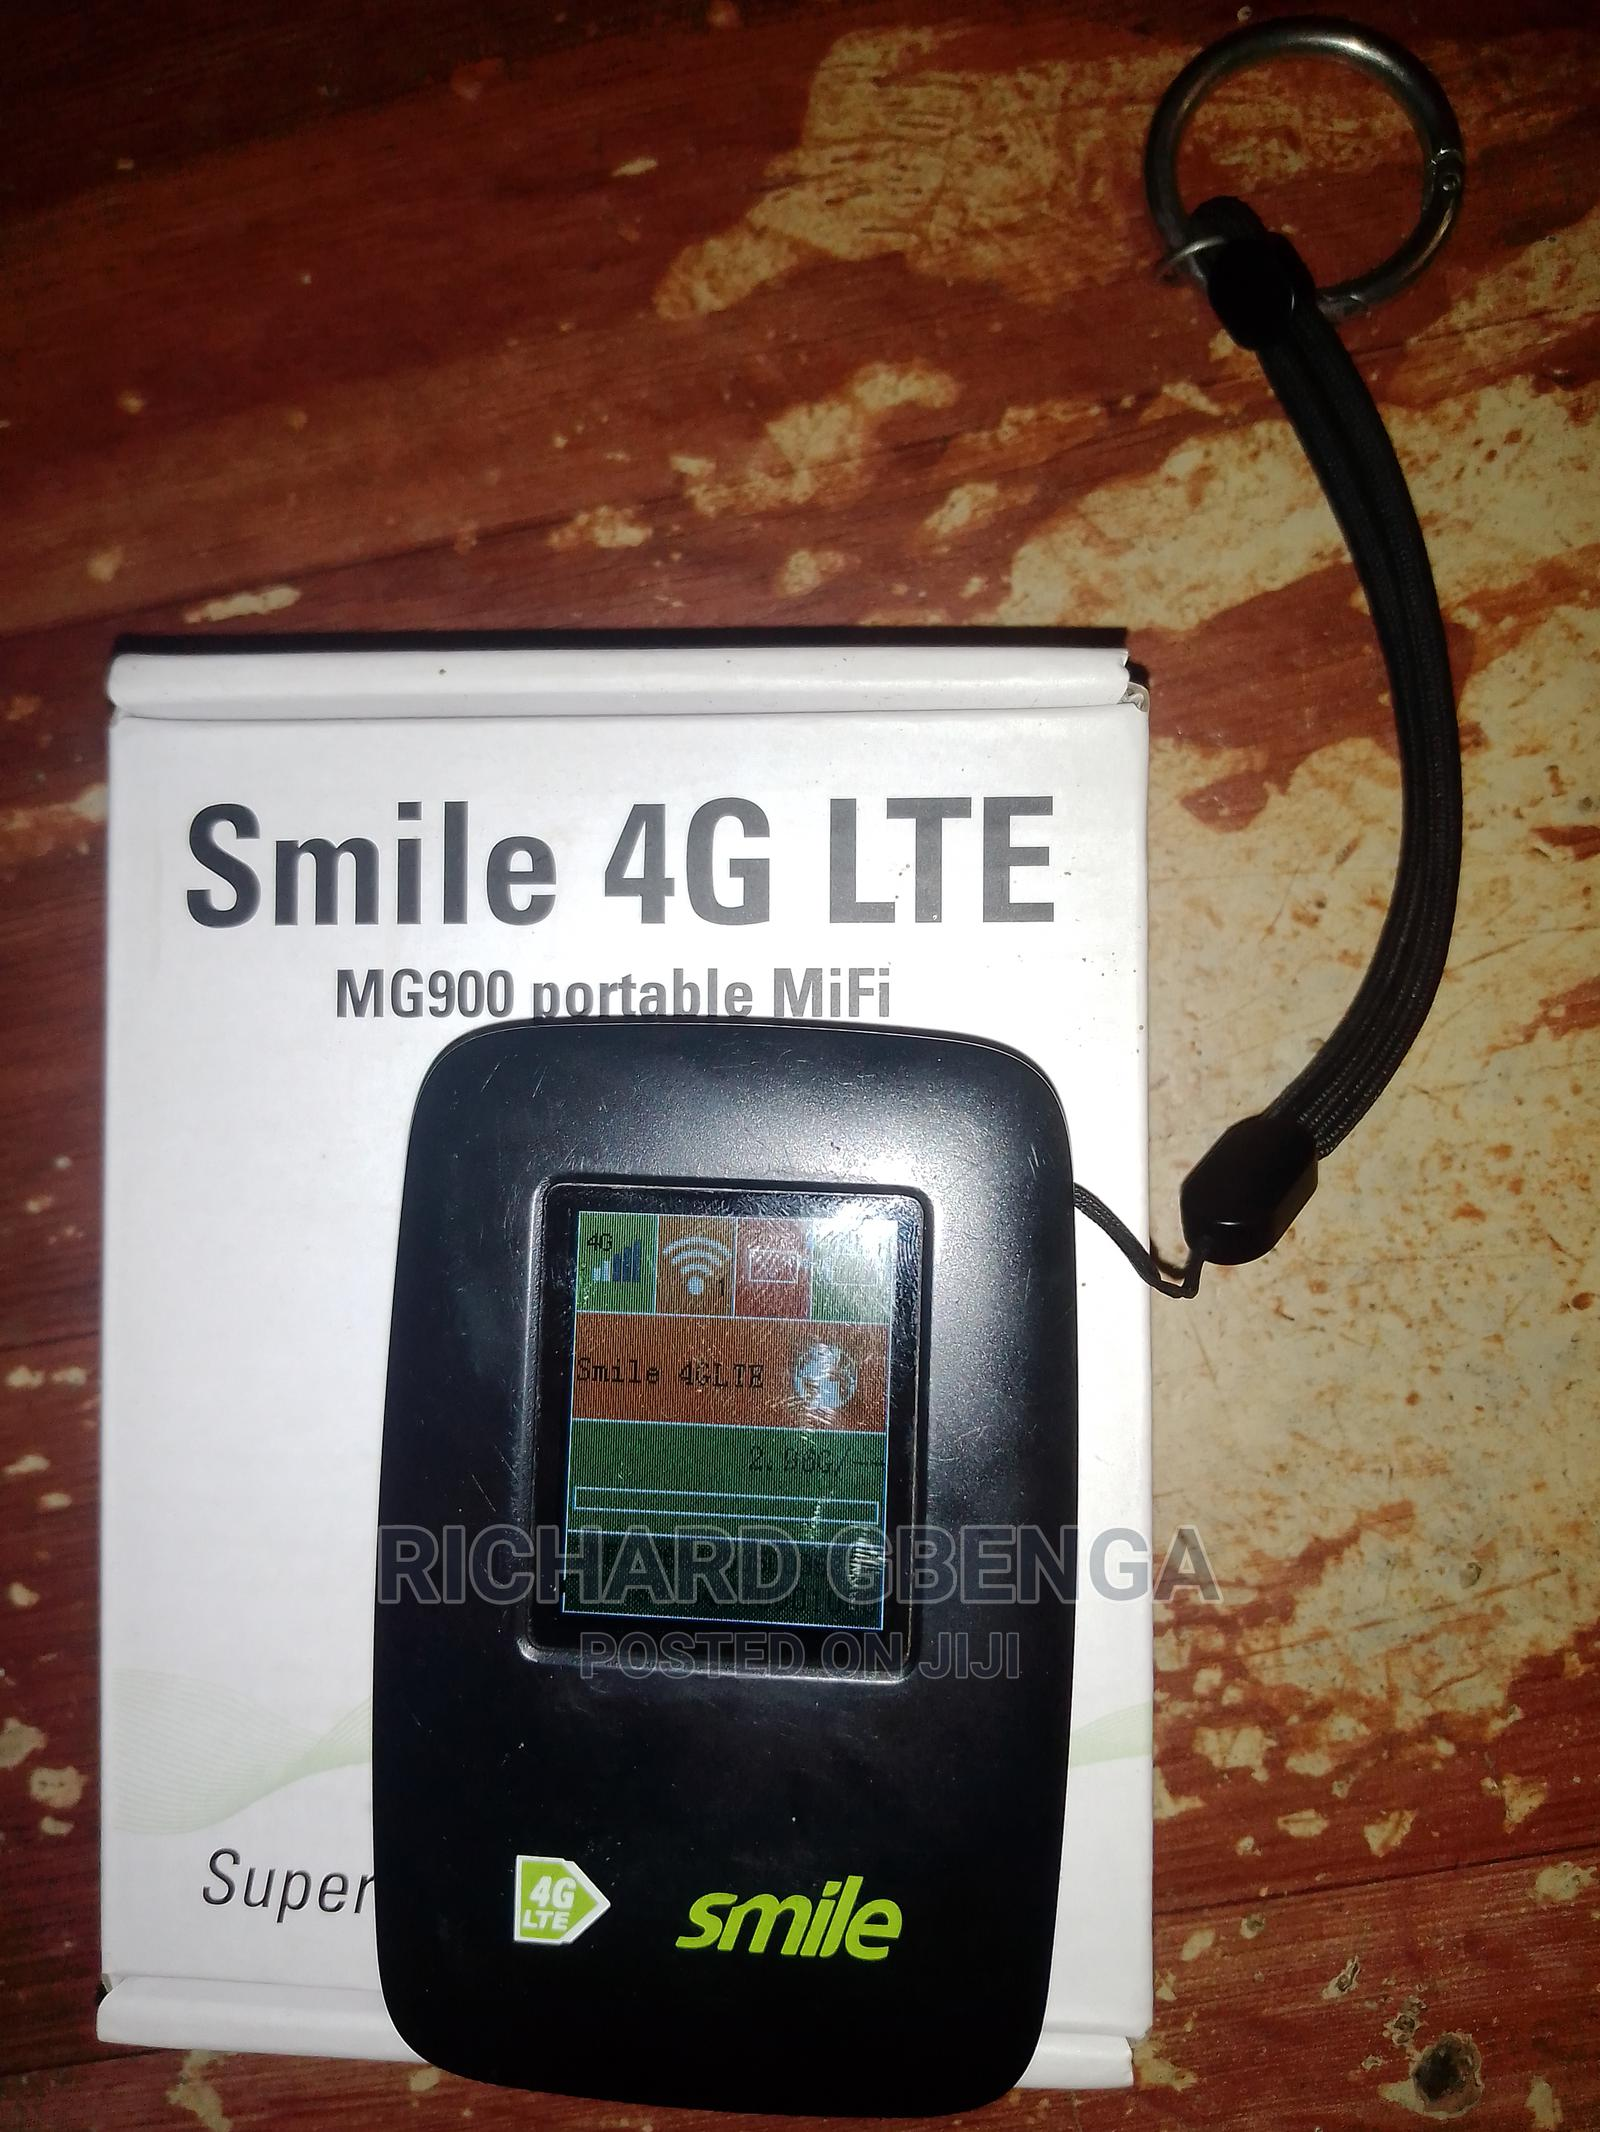 Archive: Smile 4g LTE Mg900 Portable Mifi